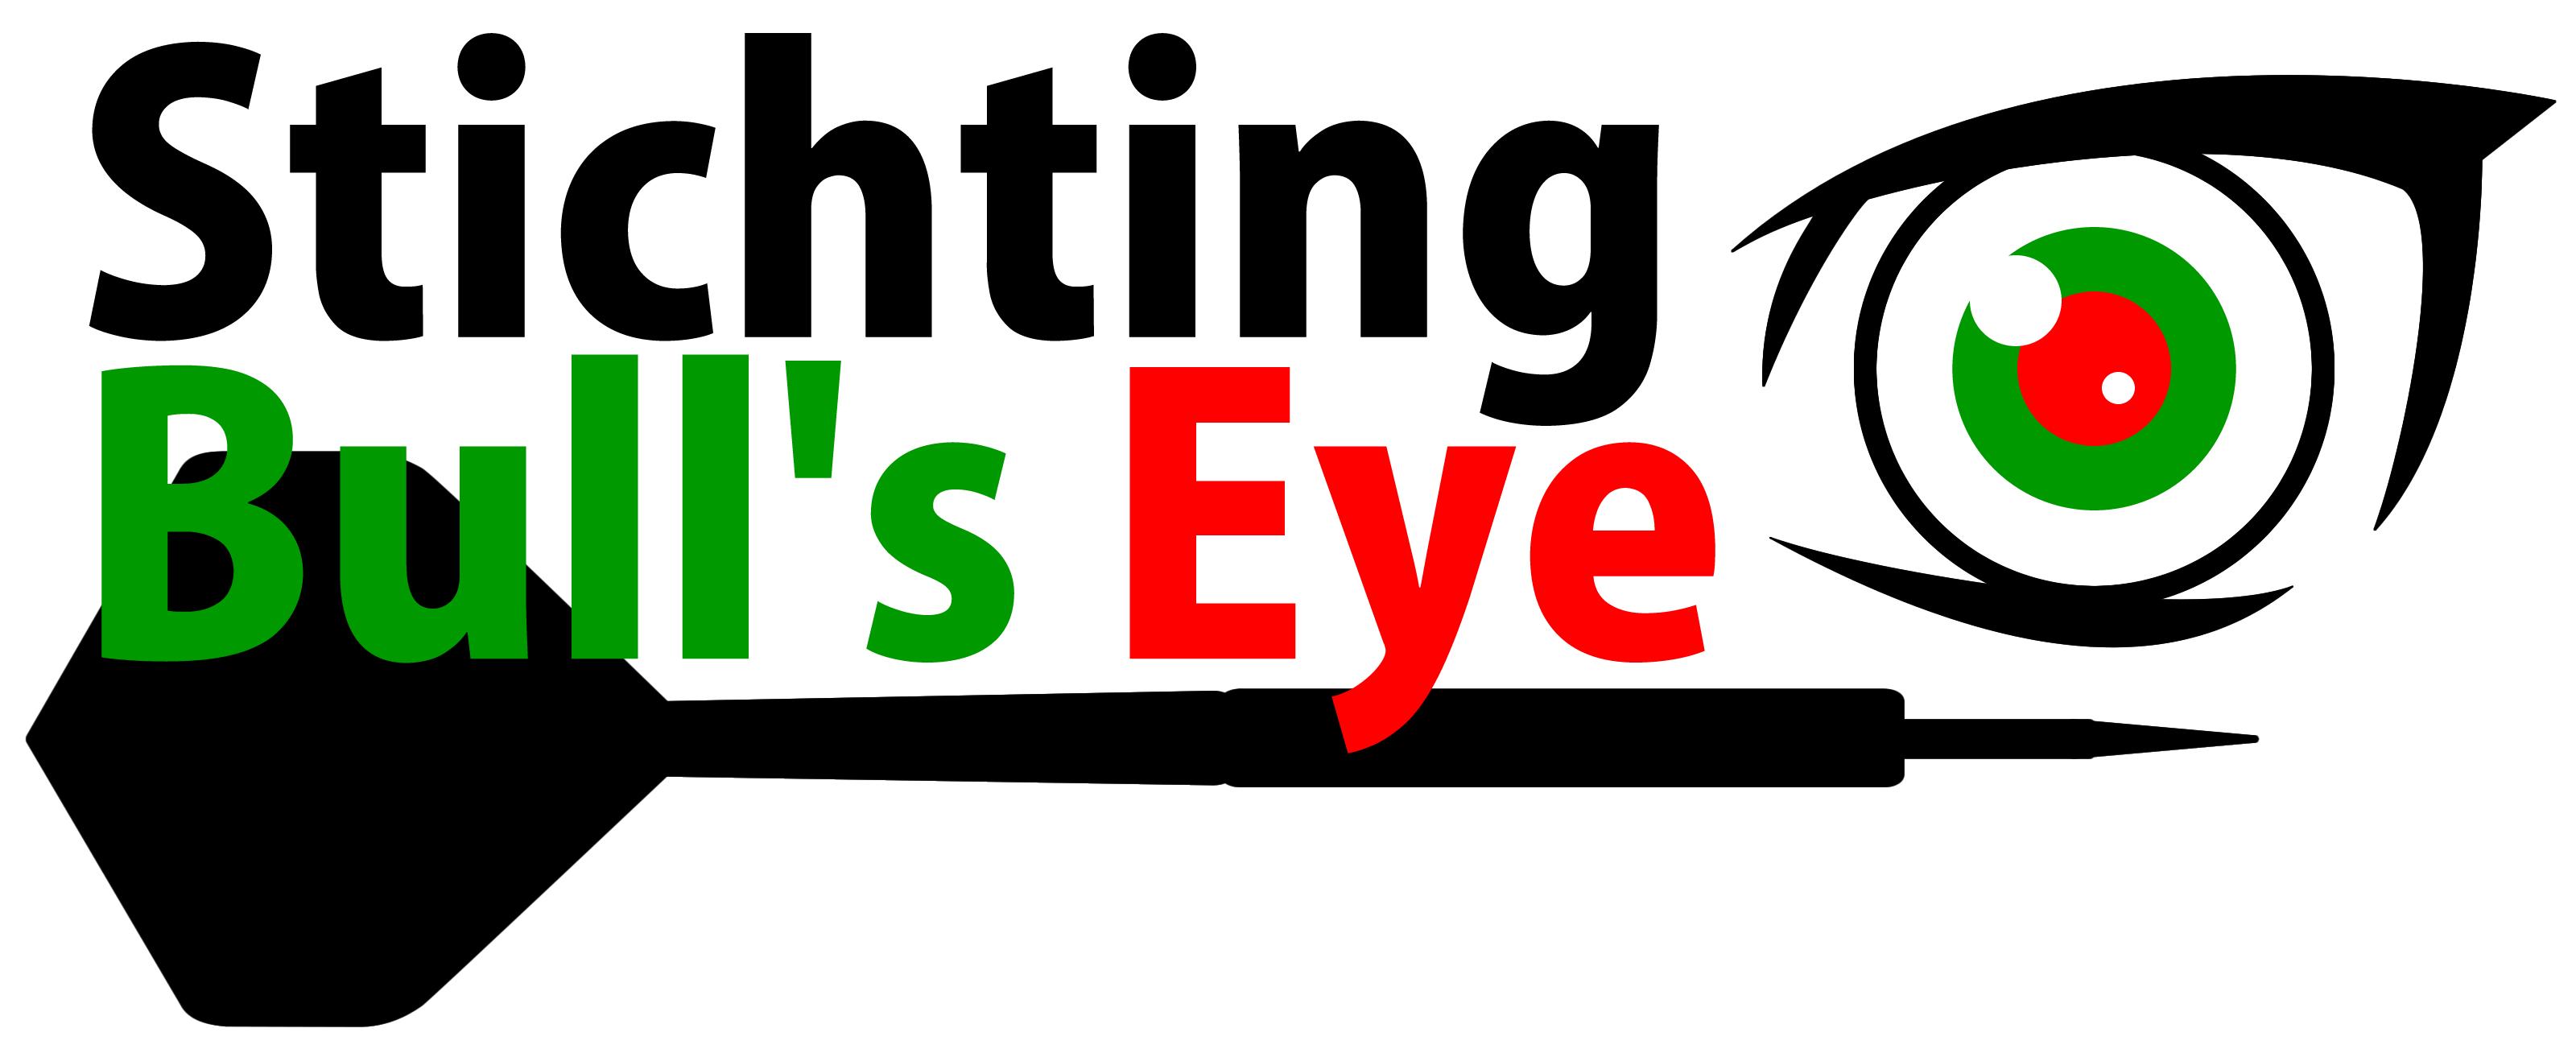 Stichting Bull's Eye